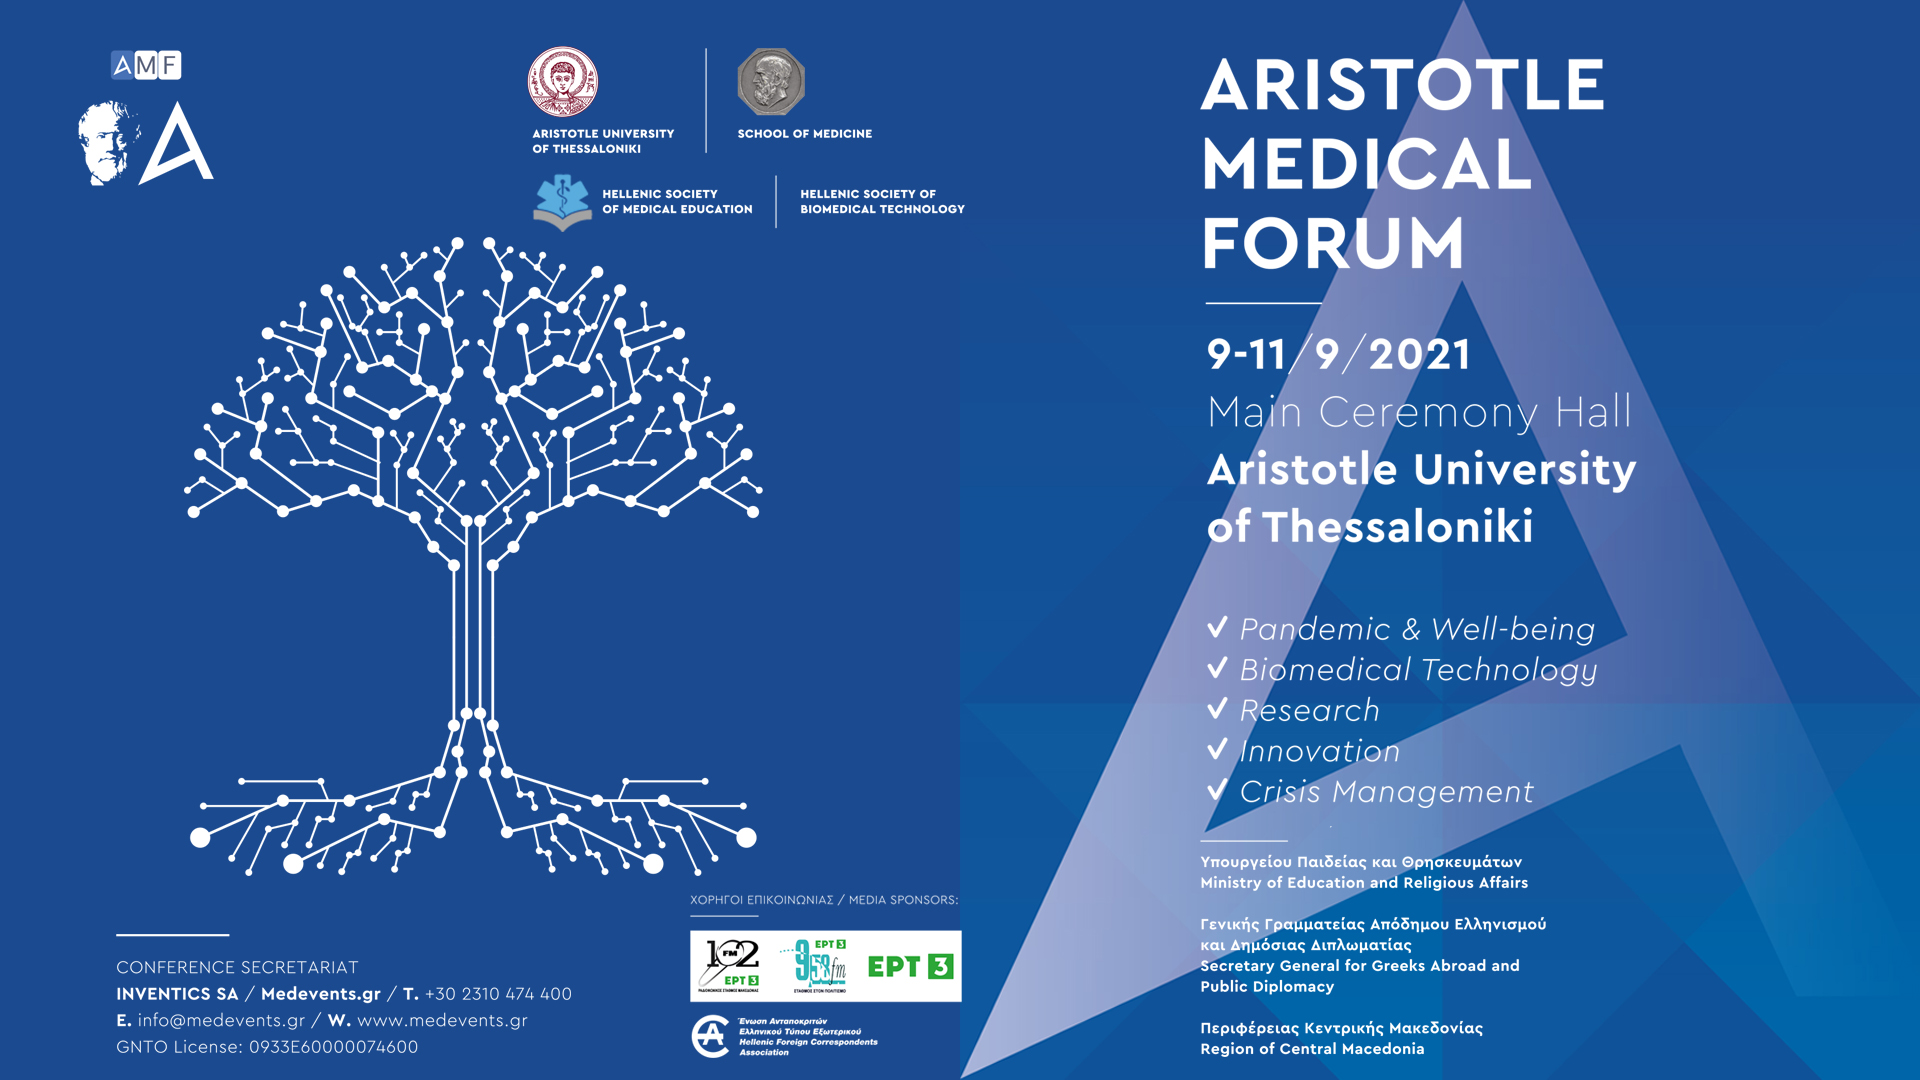 Aristotle Medical Forum AMF